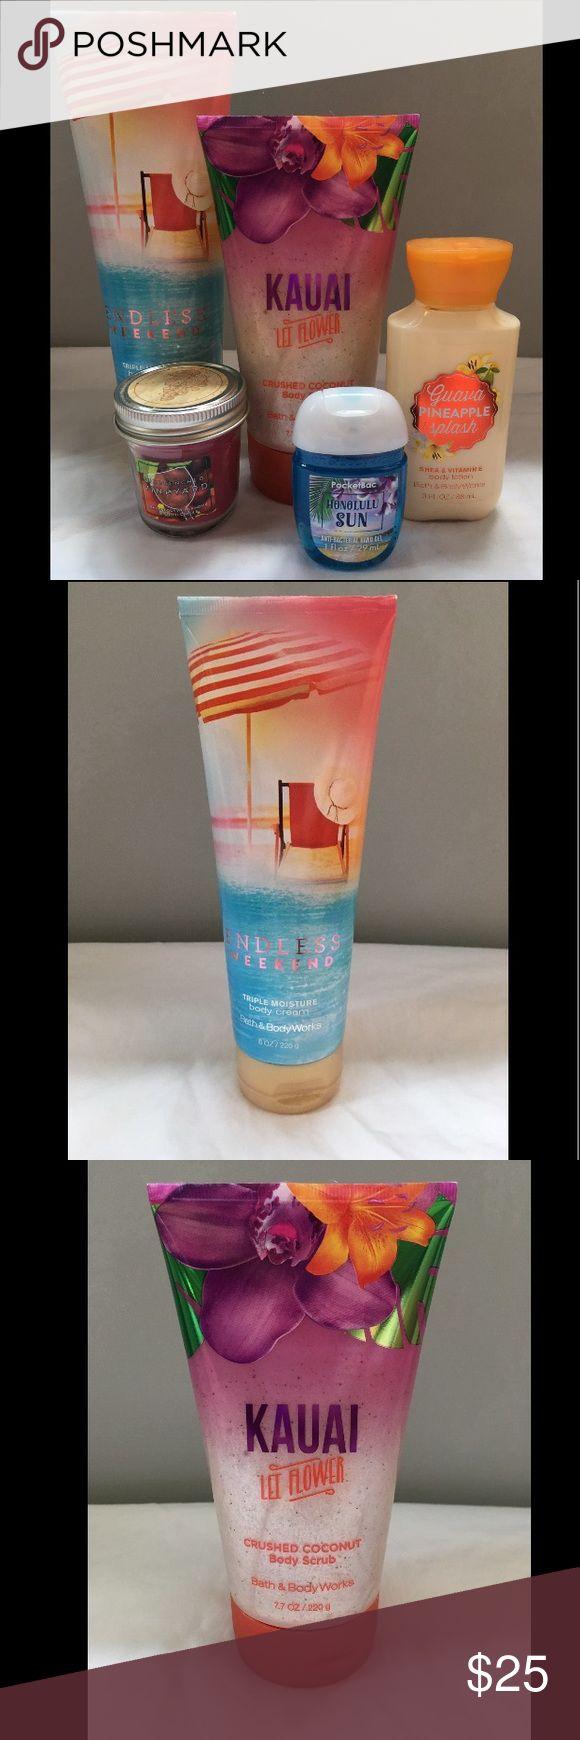 Bath and body works set (5) On sale! All never used. Endless Weekend triple moisture body cream (8oz/226g) original brand price $13 Kauai Let Flower crushed coconut body scrub (7.7 oz/220g) original brand price $16.50 Guava Pineapple Splash Shea and Vitamin E body lotion (3 fl oz/88 mL) original brand price $5 Sun-drenched Vineyard mini candle (1.3 oz/36g) original brand price $4.50 Honolulu Sun anti bacterial hand gel (1 fl oz/ 29 mL) original brand price $1.75 bath and body works Makeup